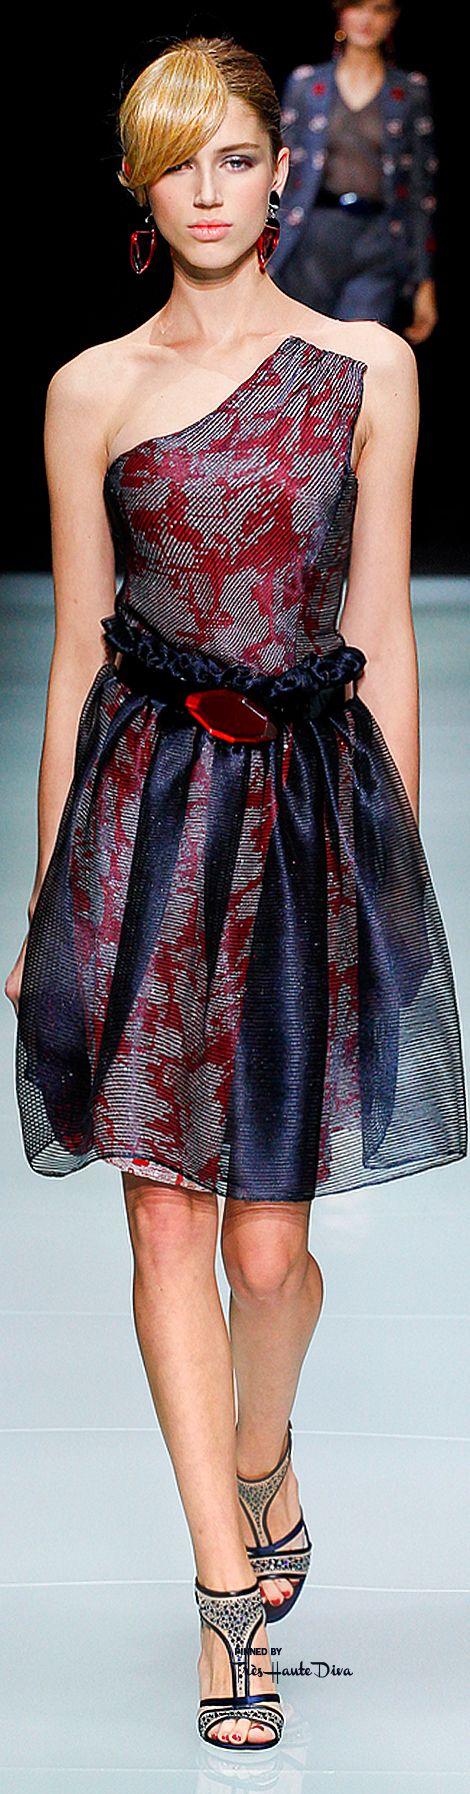 Giorgio Armani Spring 2016 RTW ♔ Très Haute Diva ♔ For more fashion go to my website at http://www.treshautediva.com/